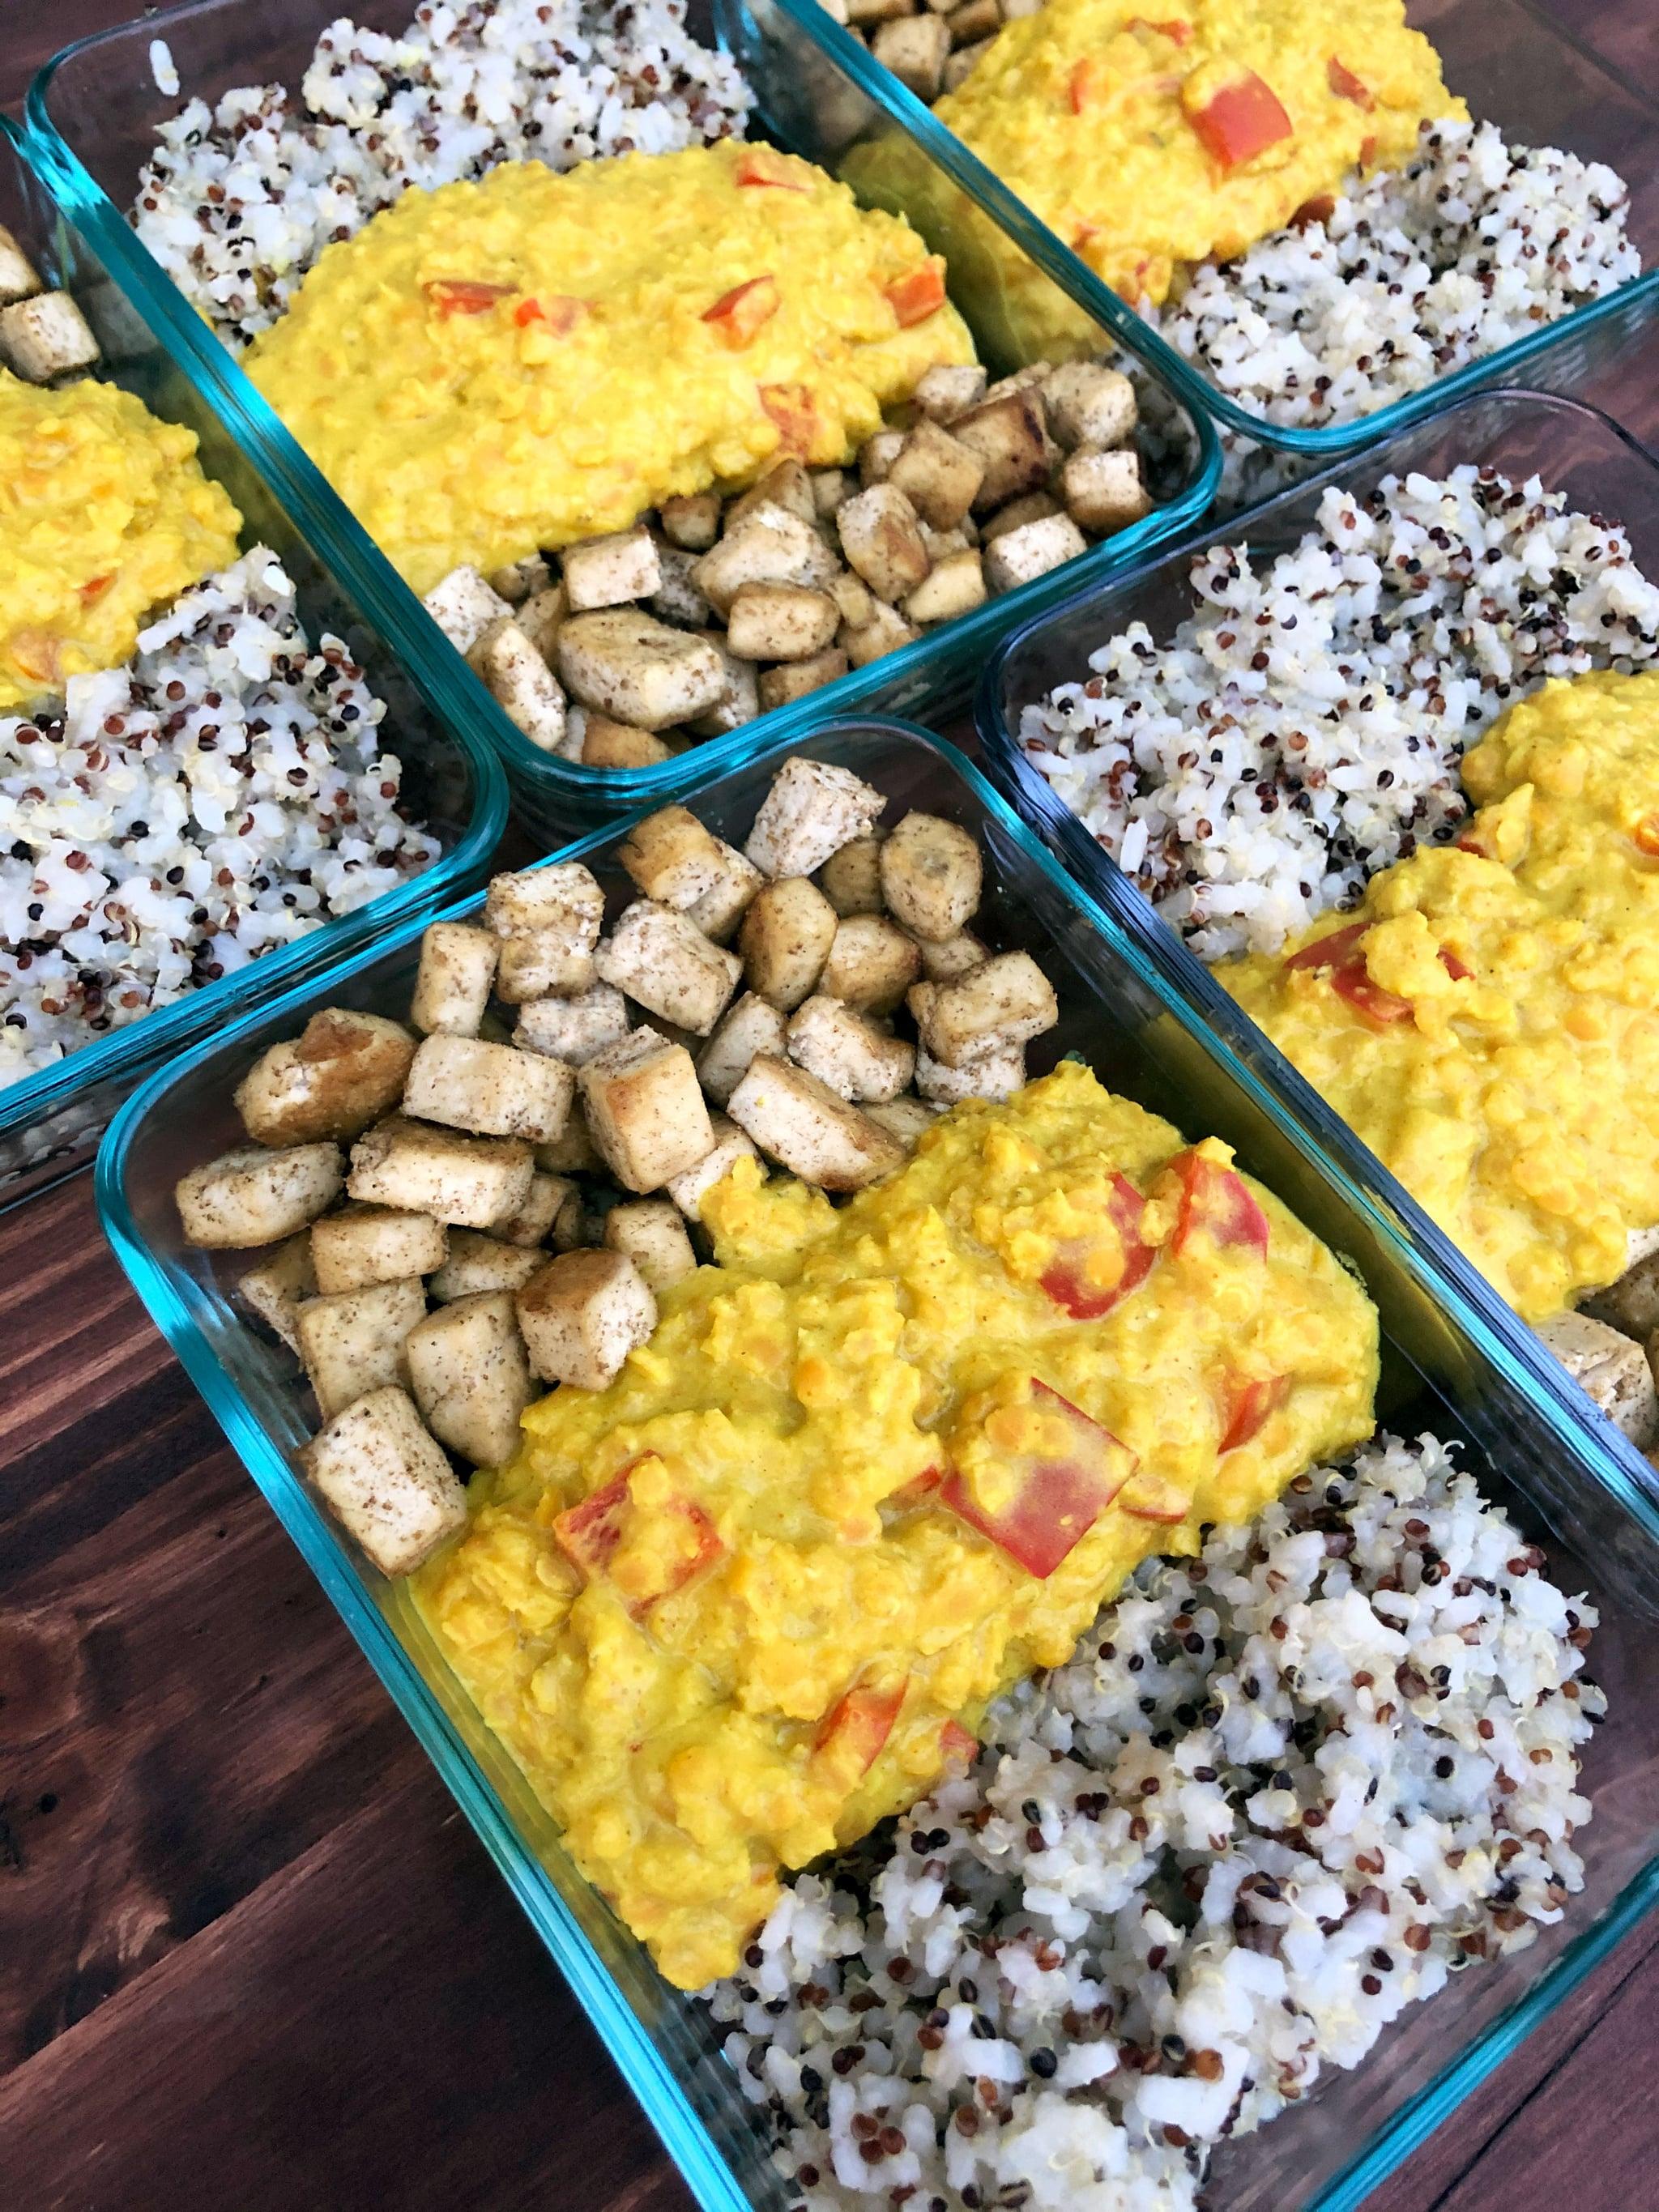 Vegan Curried Coconut Lentils Tofu And Quinoa Meal Prep Popsugar Fitness Australia